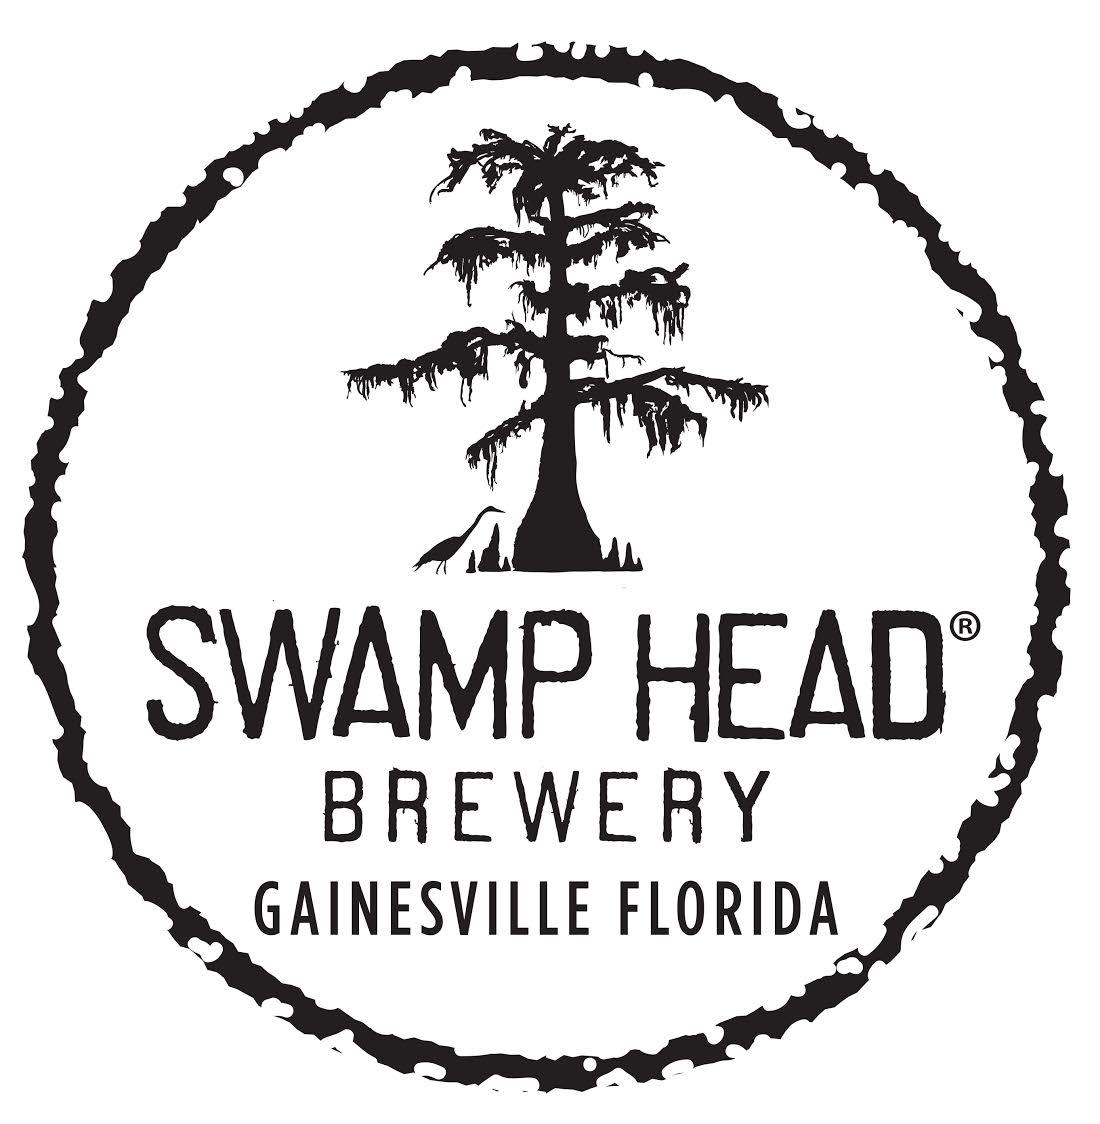 Swamp Head